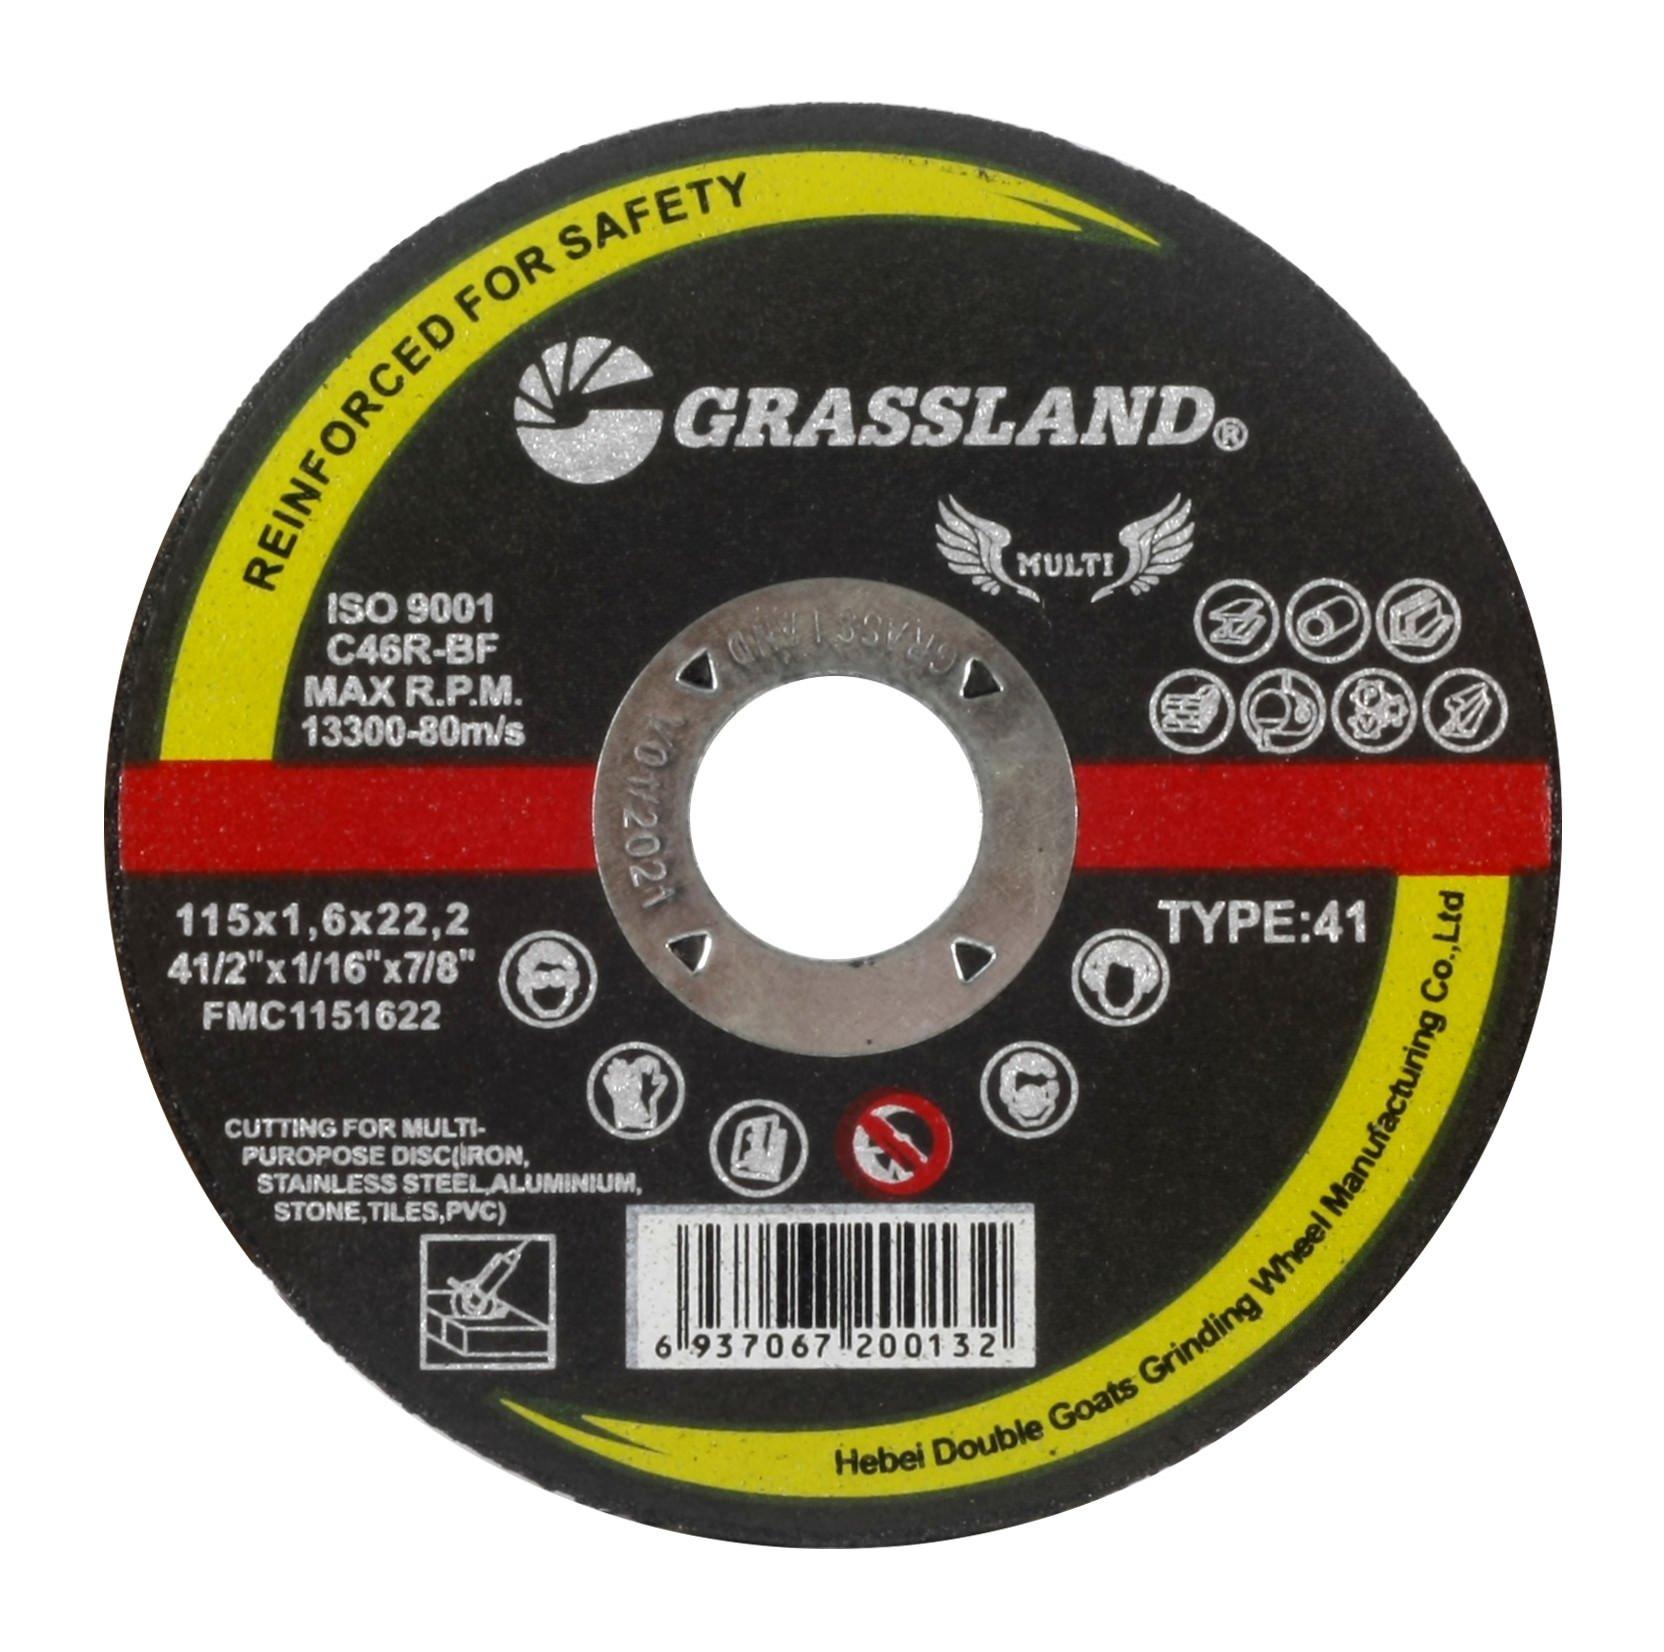 Cutting Disc, Multi-Purpose Freehand Cut-off wheel - 4-1/2'' x 1/16'' x 7/8'' - T41 - (30 PACK)